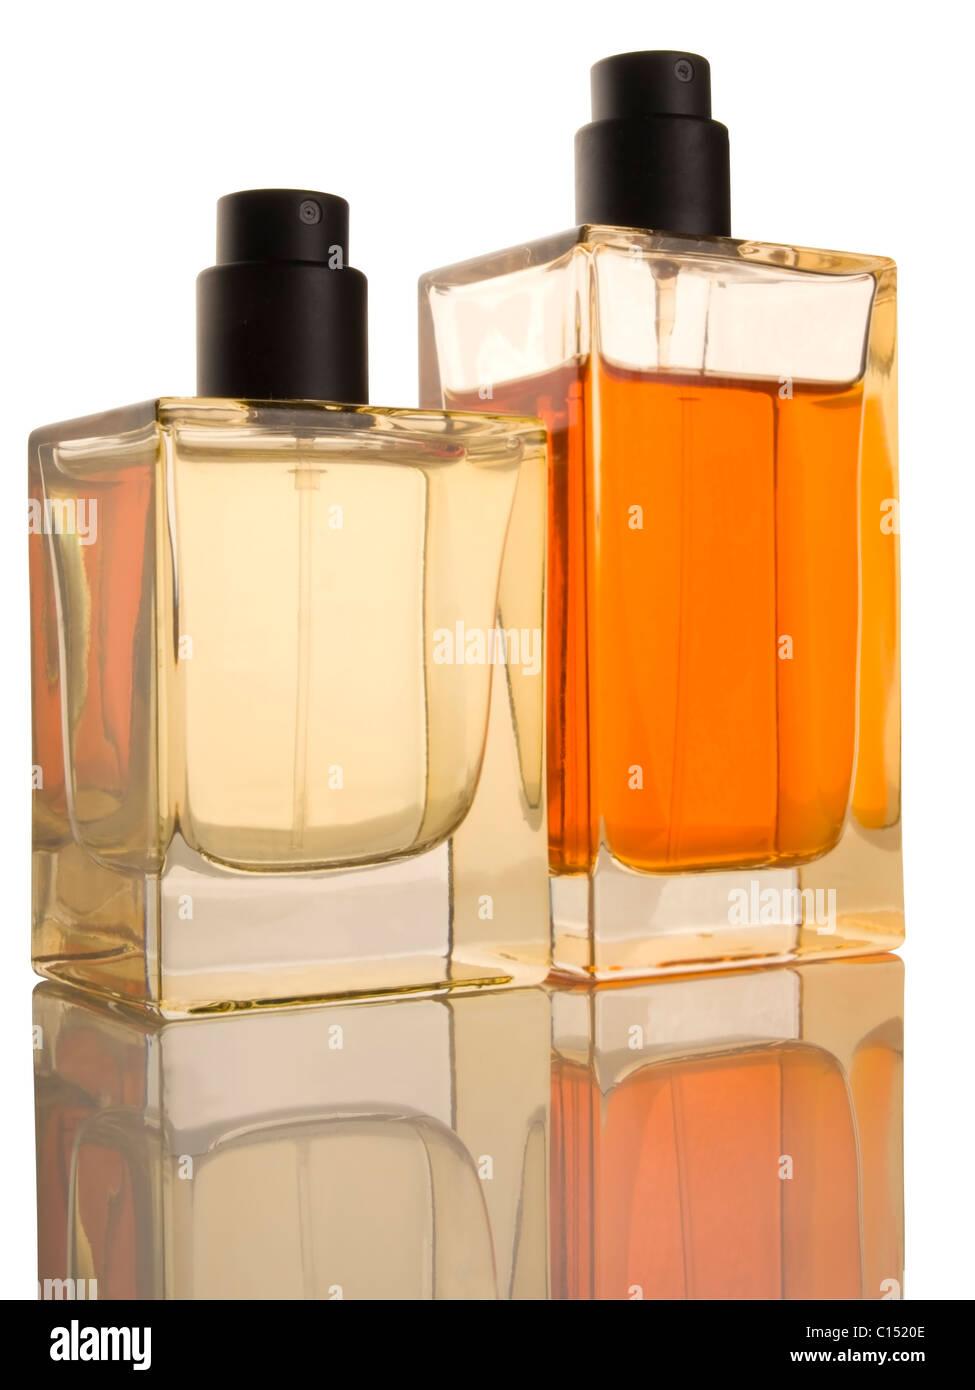 two perfume botles - Stock Image